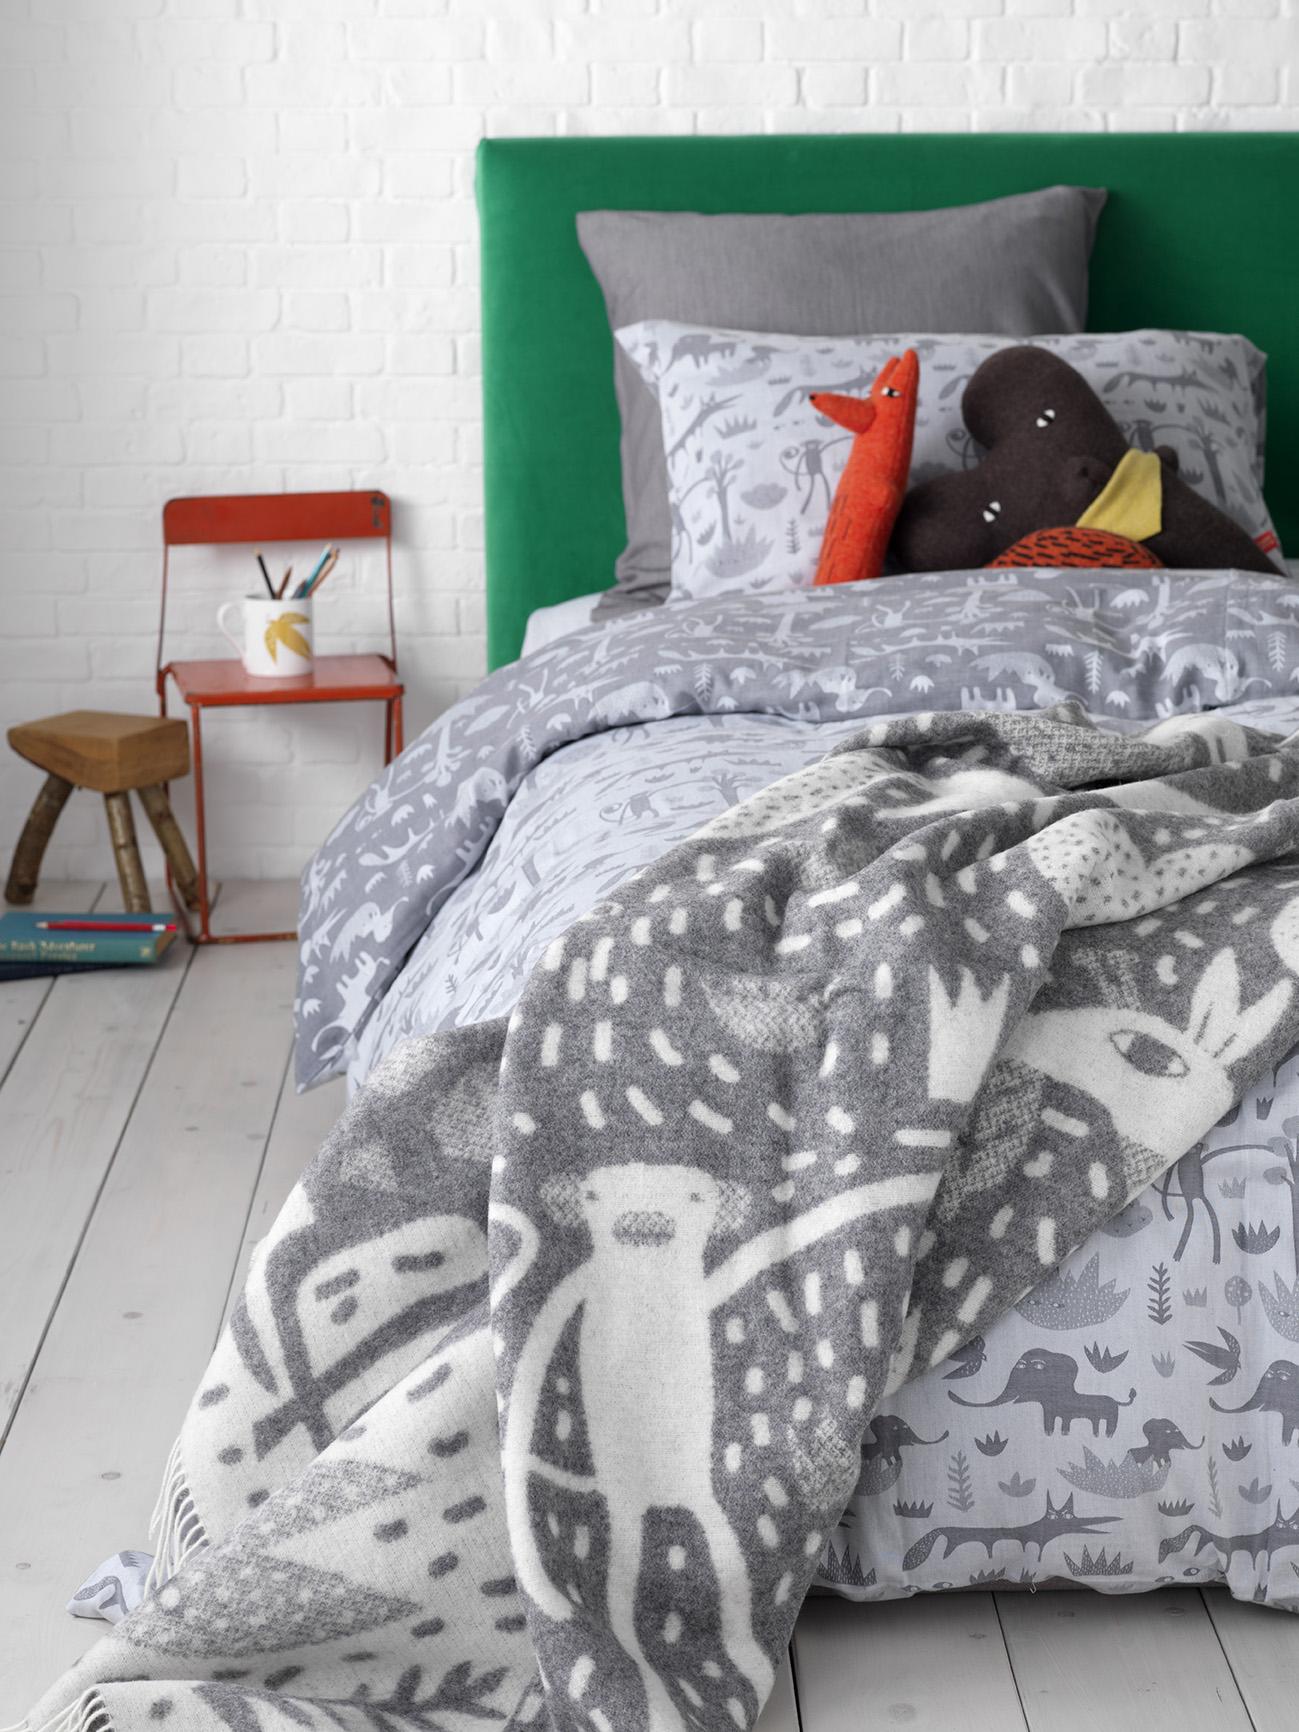 Donna Wilson Collaboration for Secret Linen Store, Menagerie Bed Linen, Throw, single duvet and pillowcase set £59